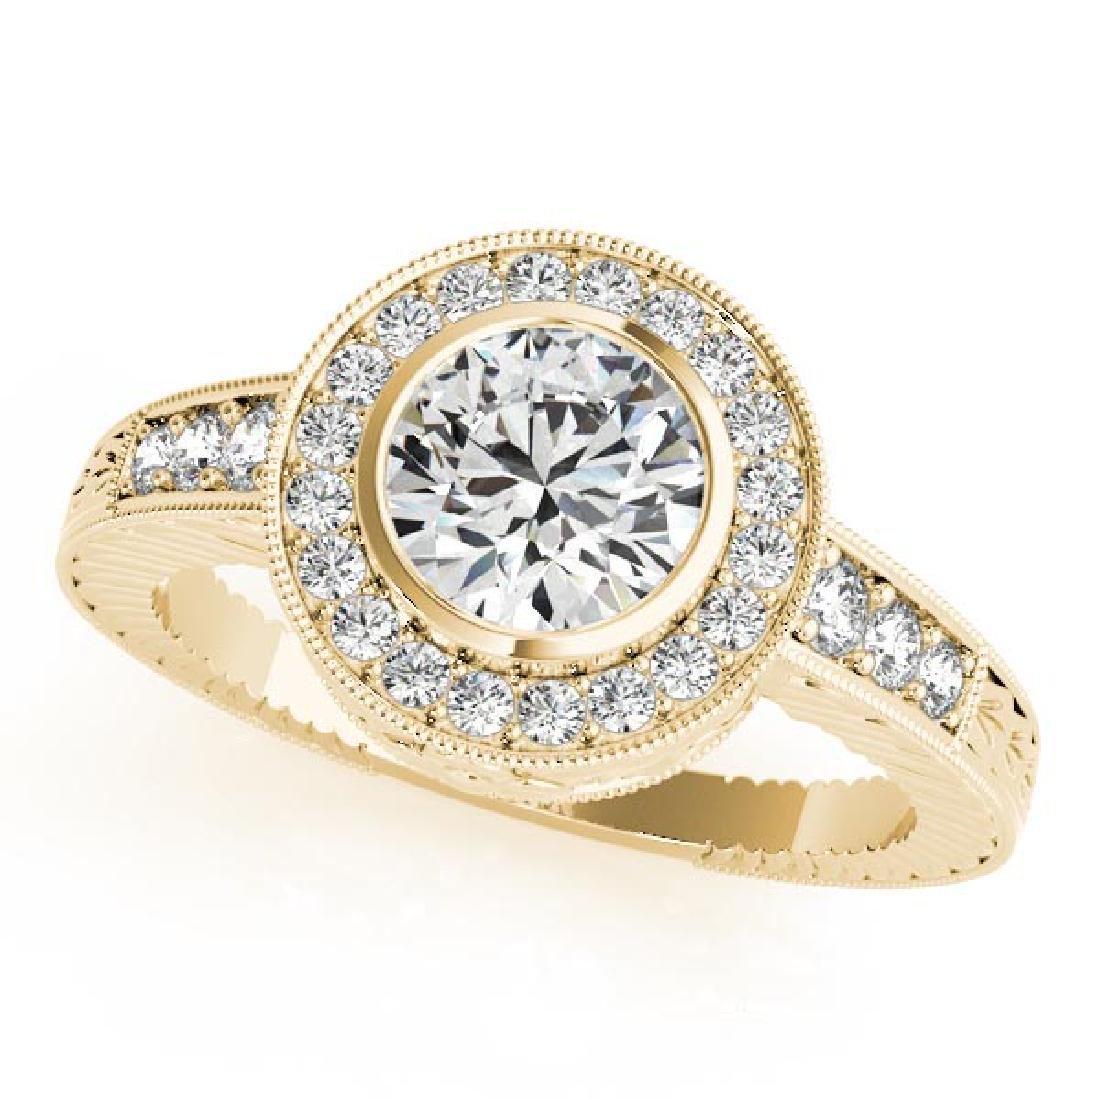 CERTIFIED 18K YELLOW GOLD 1.42 CT G-H/VS-SI1 DIAMOND HA